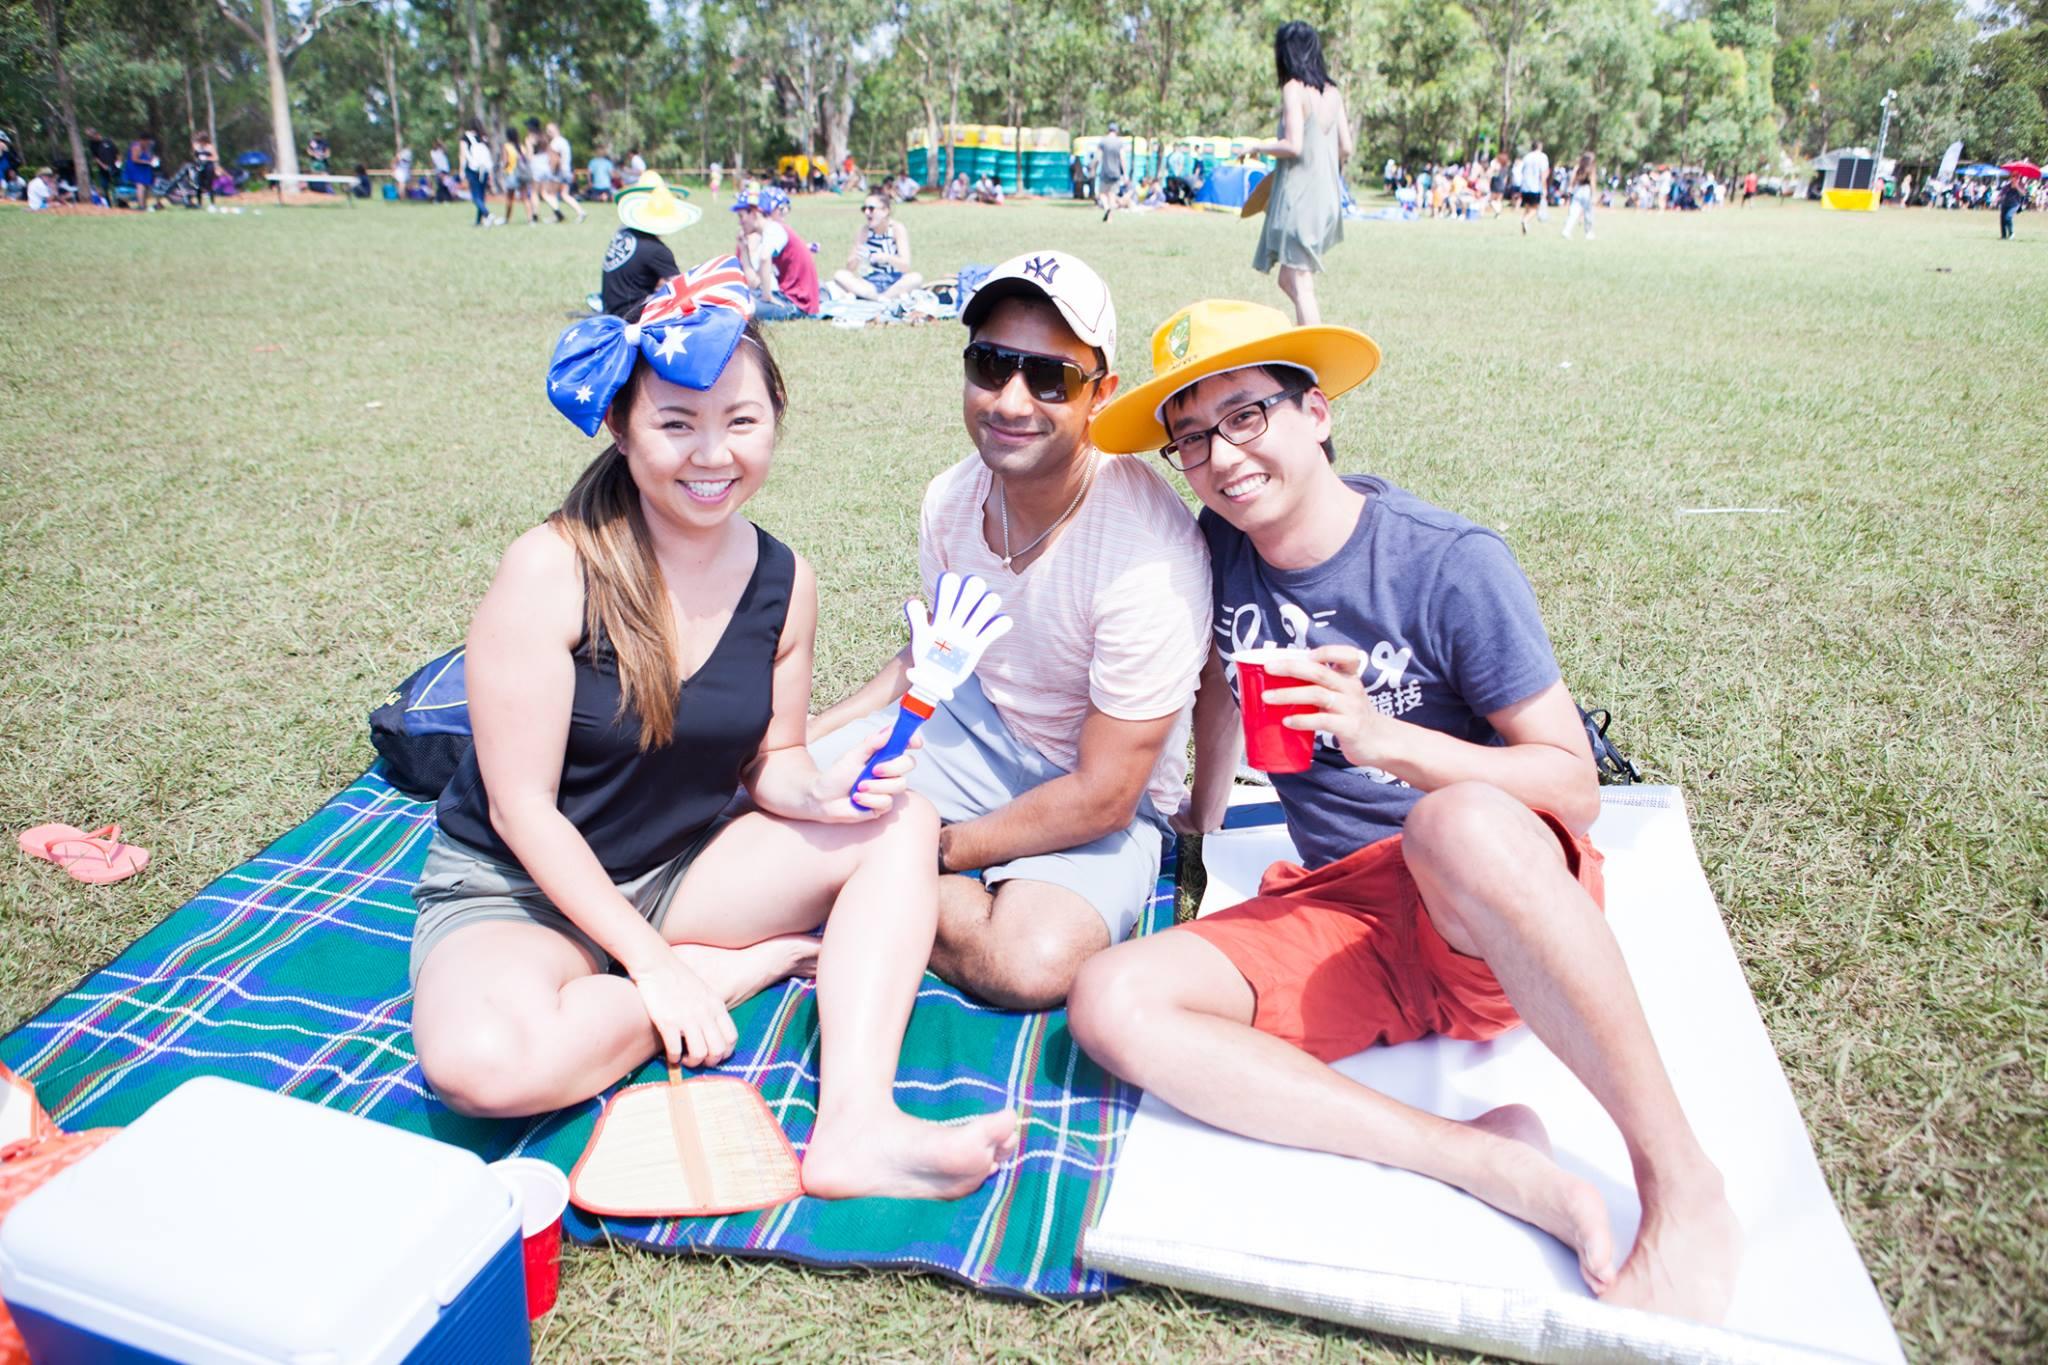 Australia Day Parramatta [Sydney]